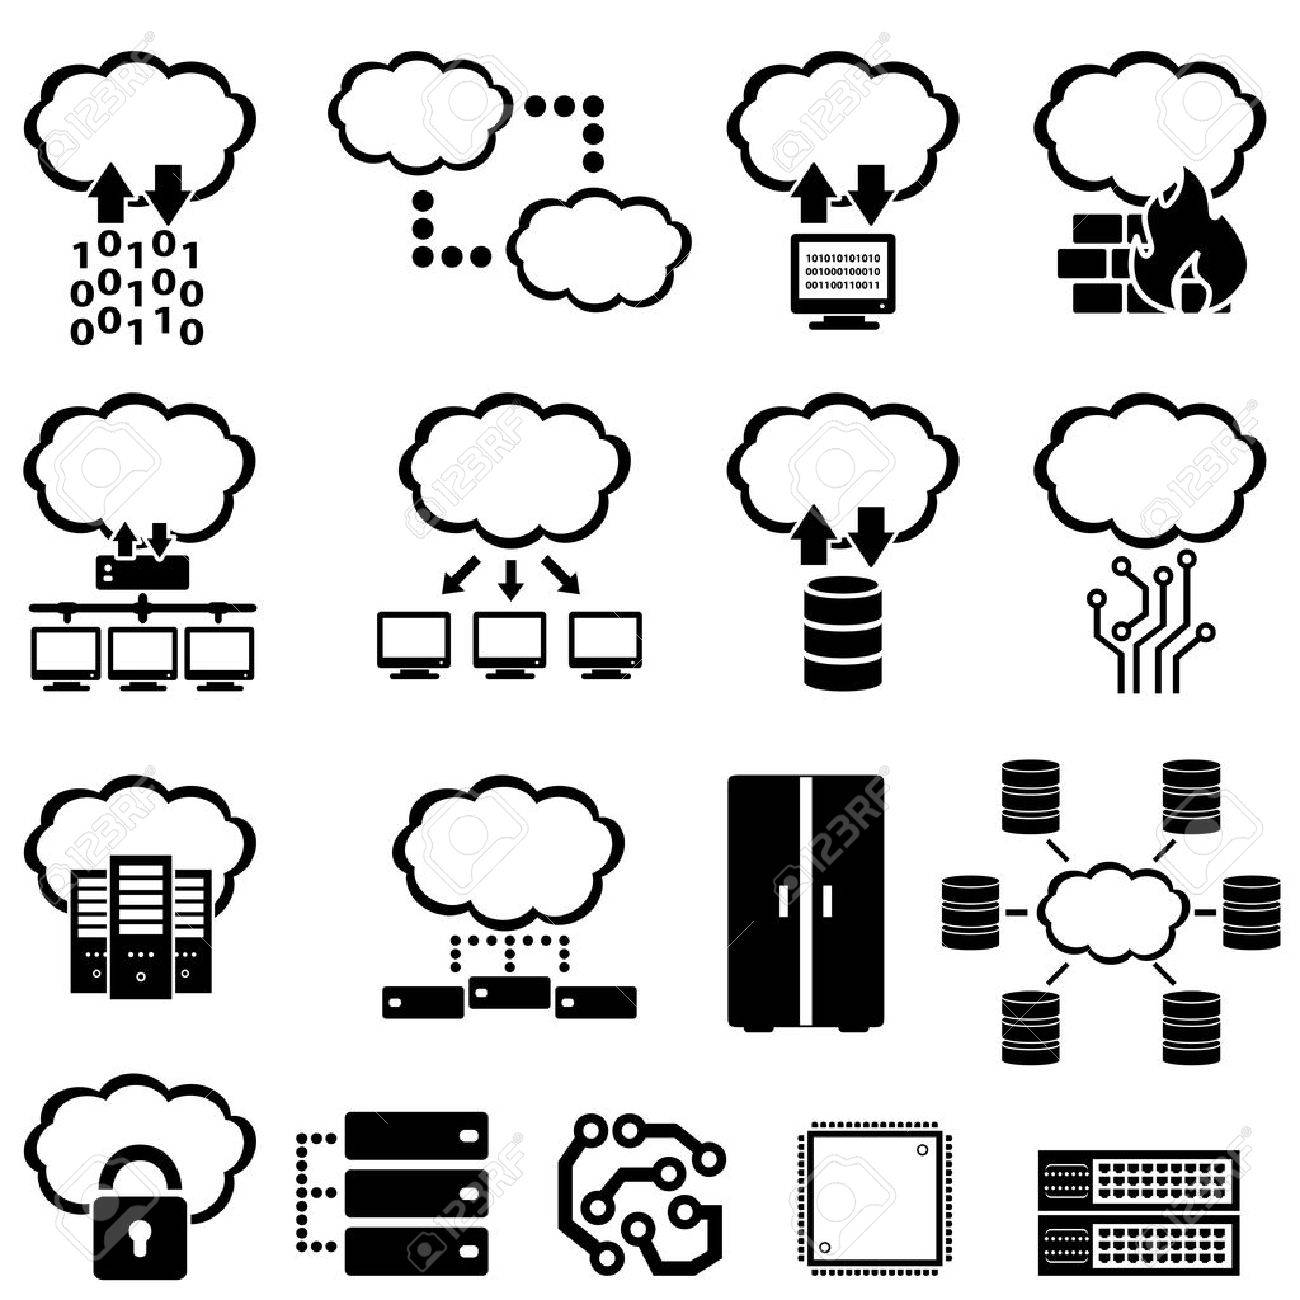 Big data, technology and cloud computing icons - 44477694